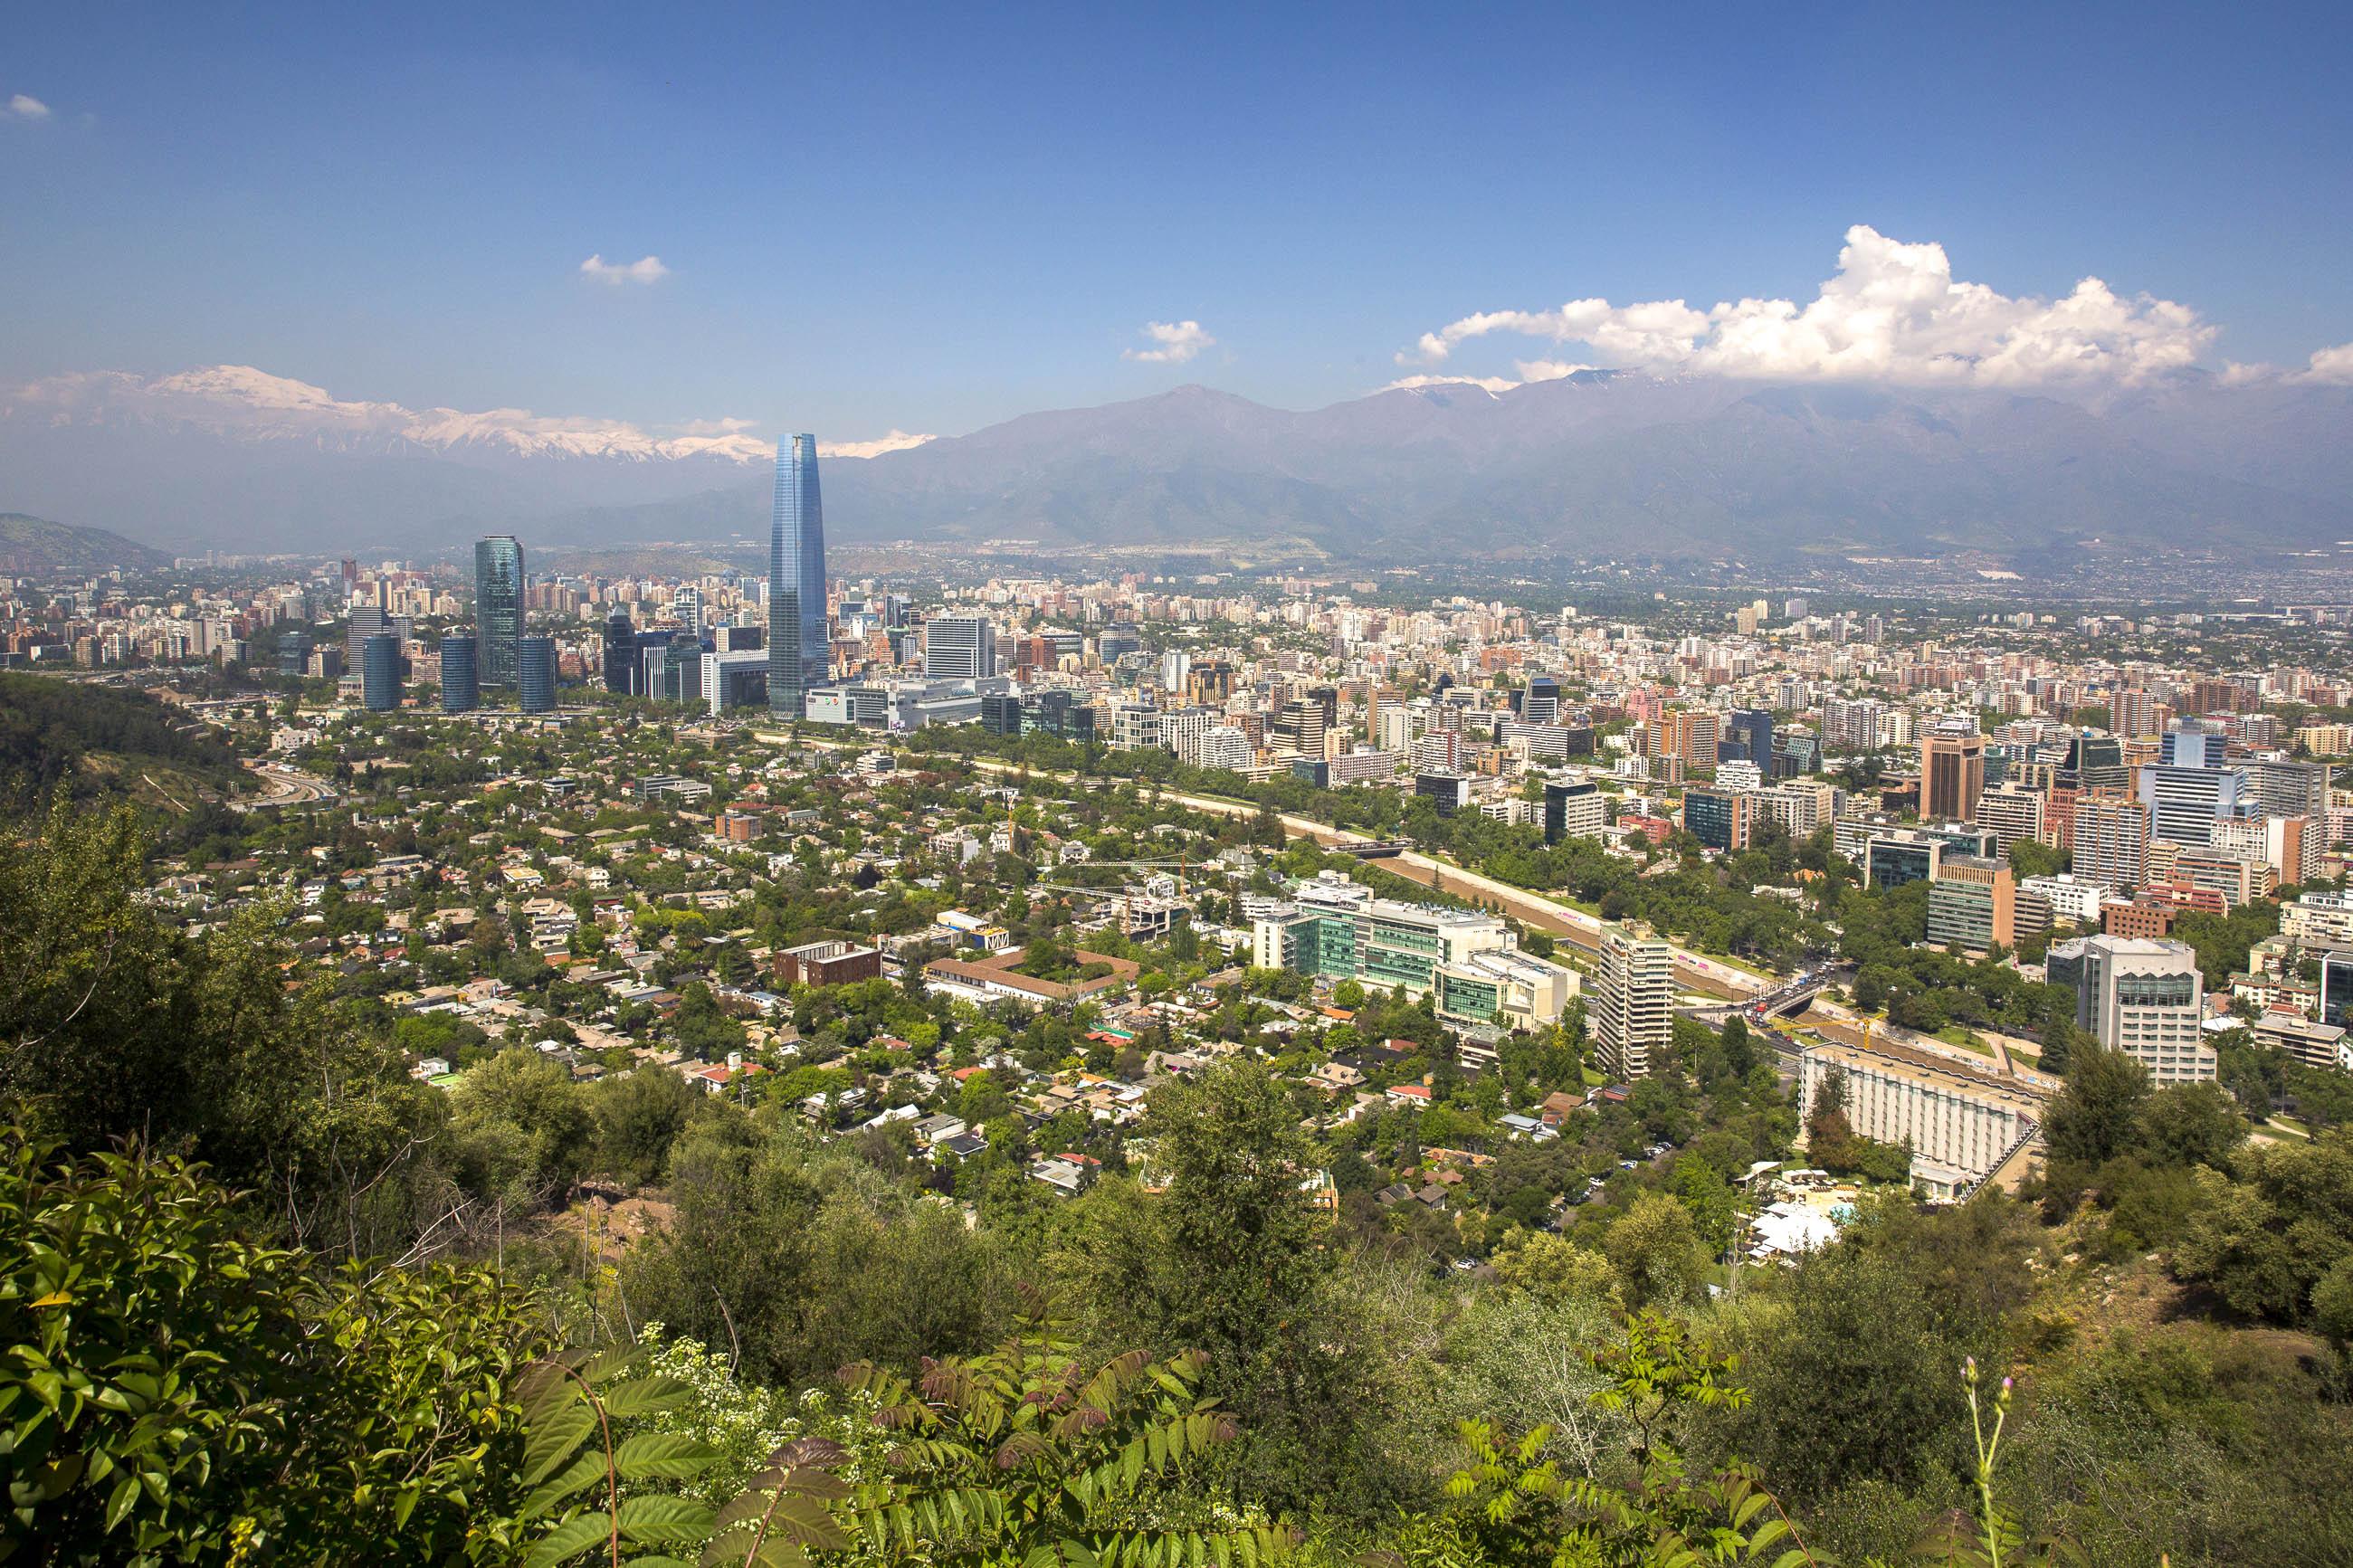 BILDER: 10 Top Shots von Santiago de Chile, Chile | Franks ...